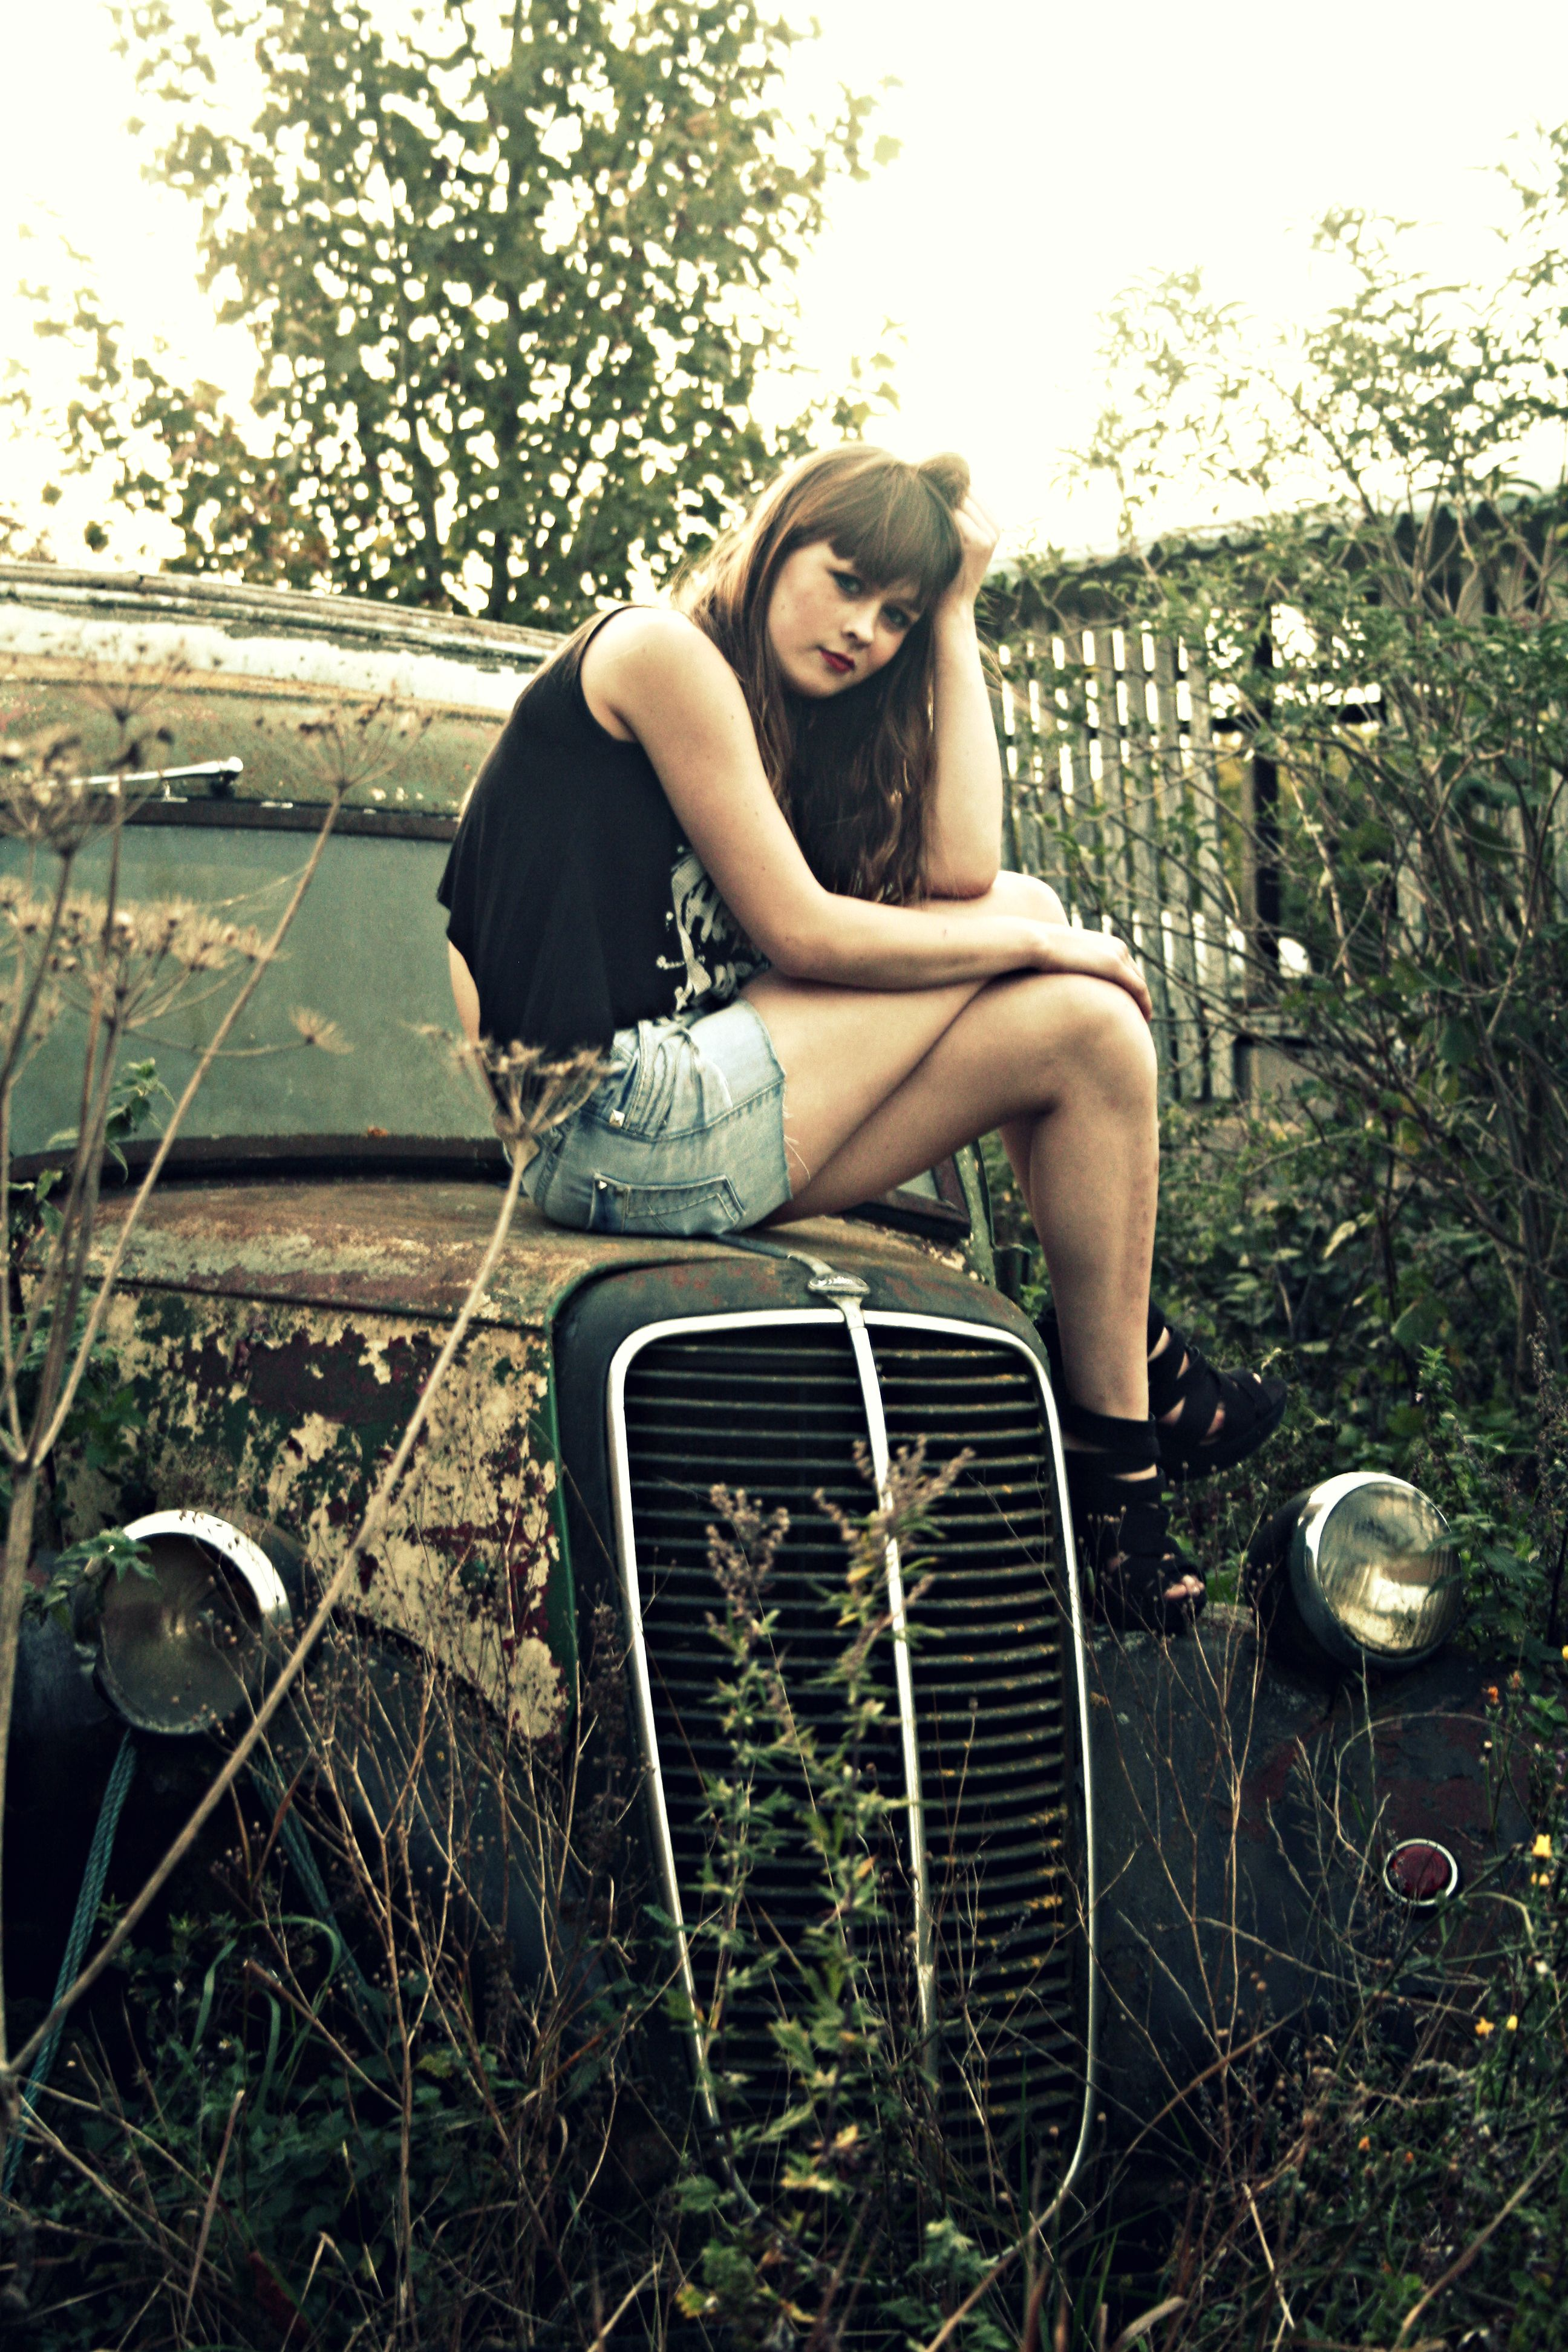 Sitting On The Old Vintage Car Photo Ideas Pinterest Old